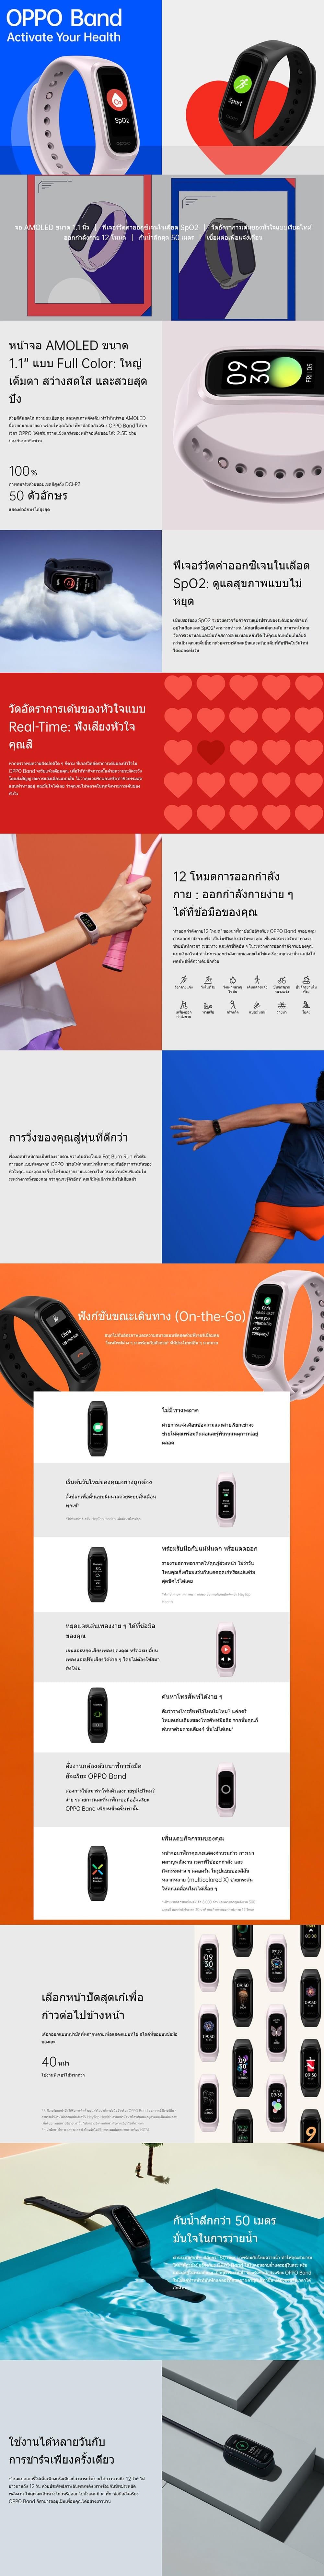 01-9000011509-feature.jpg